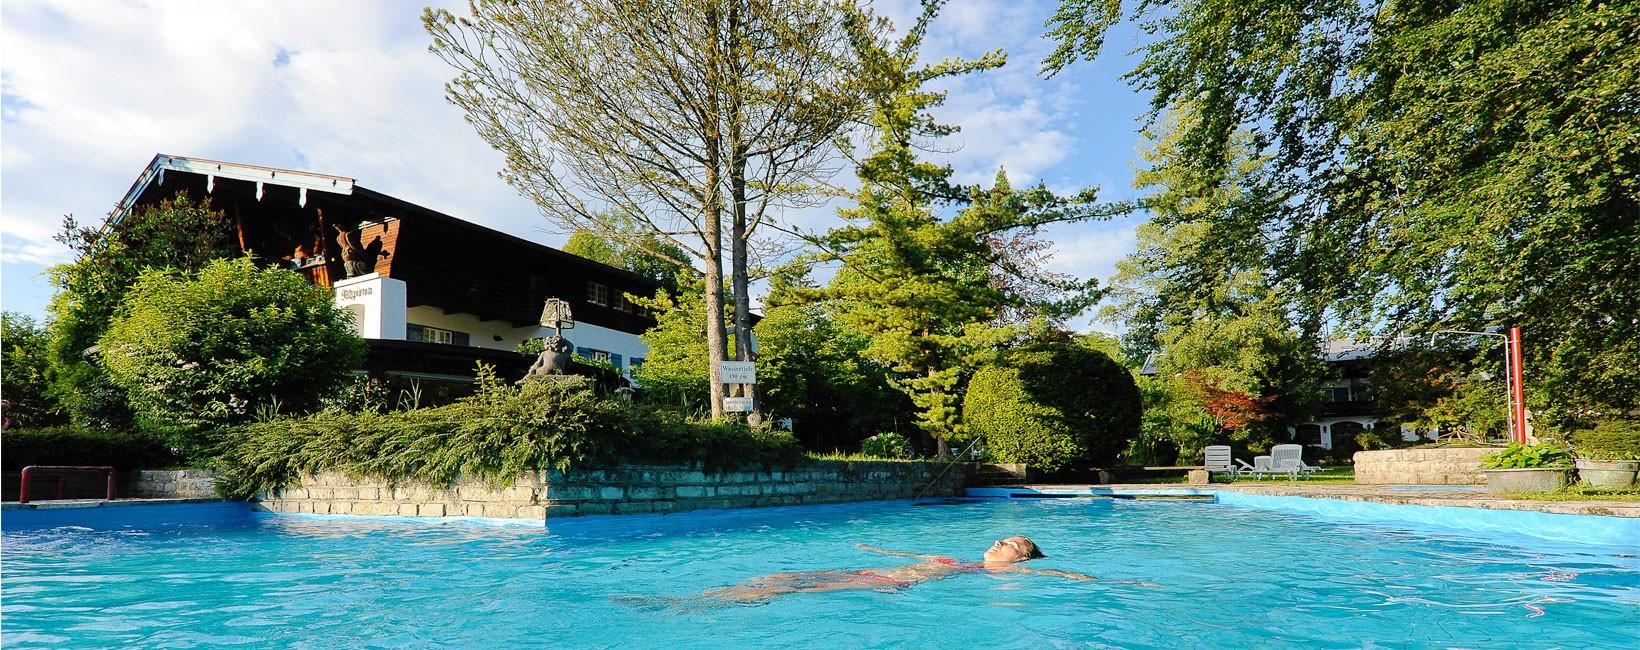 Hotel Alpina Aussenpool